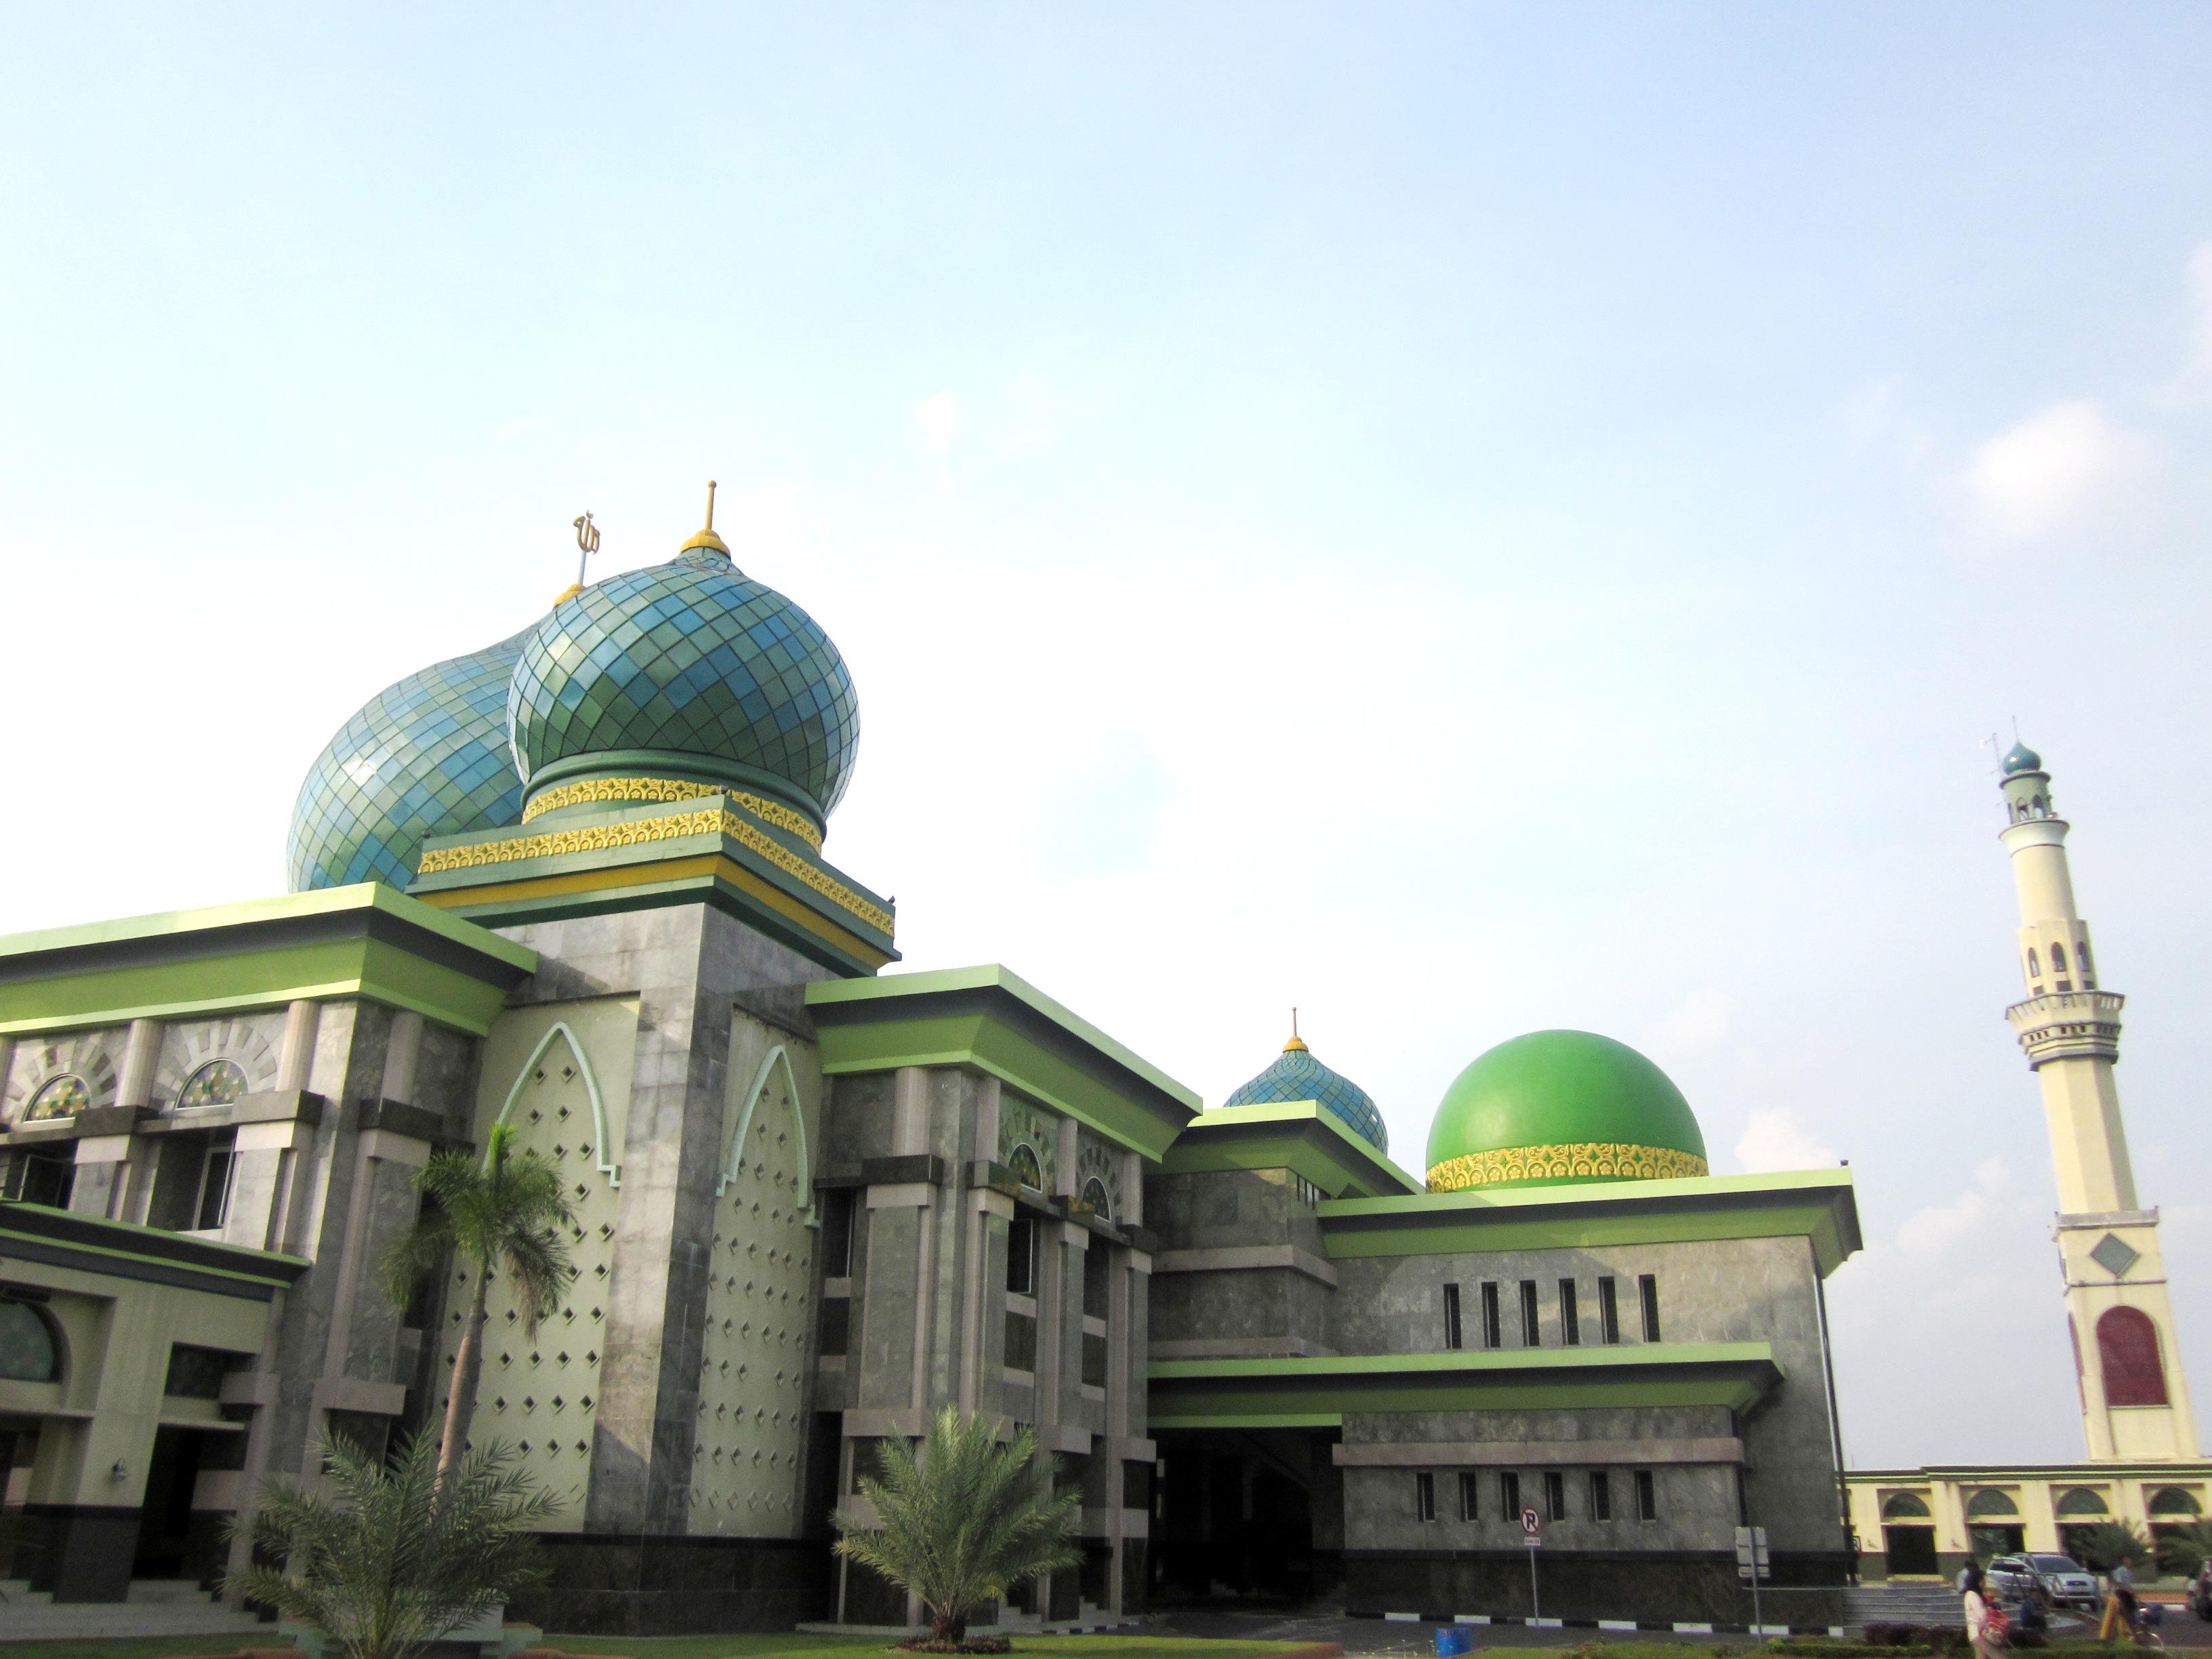 Masjid Agung Nur Dunia Jakarta Islamic Centre Pekanbaru Riau Raya